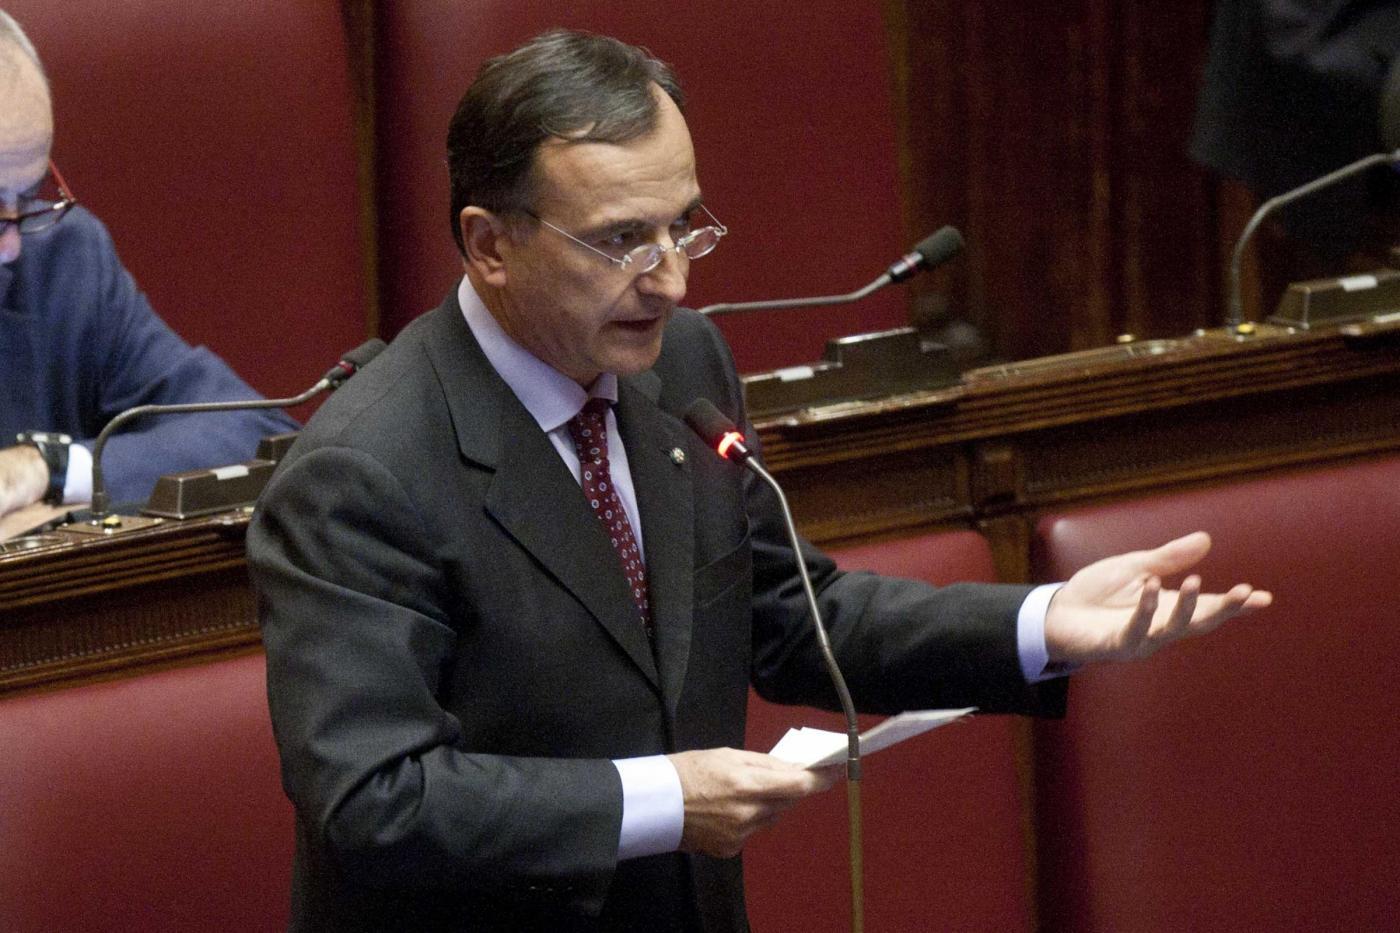 Franco Frattini (Lapresse)